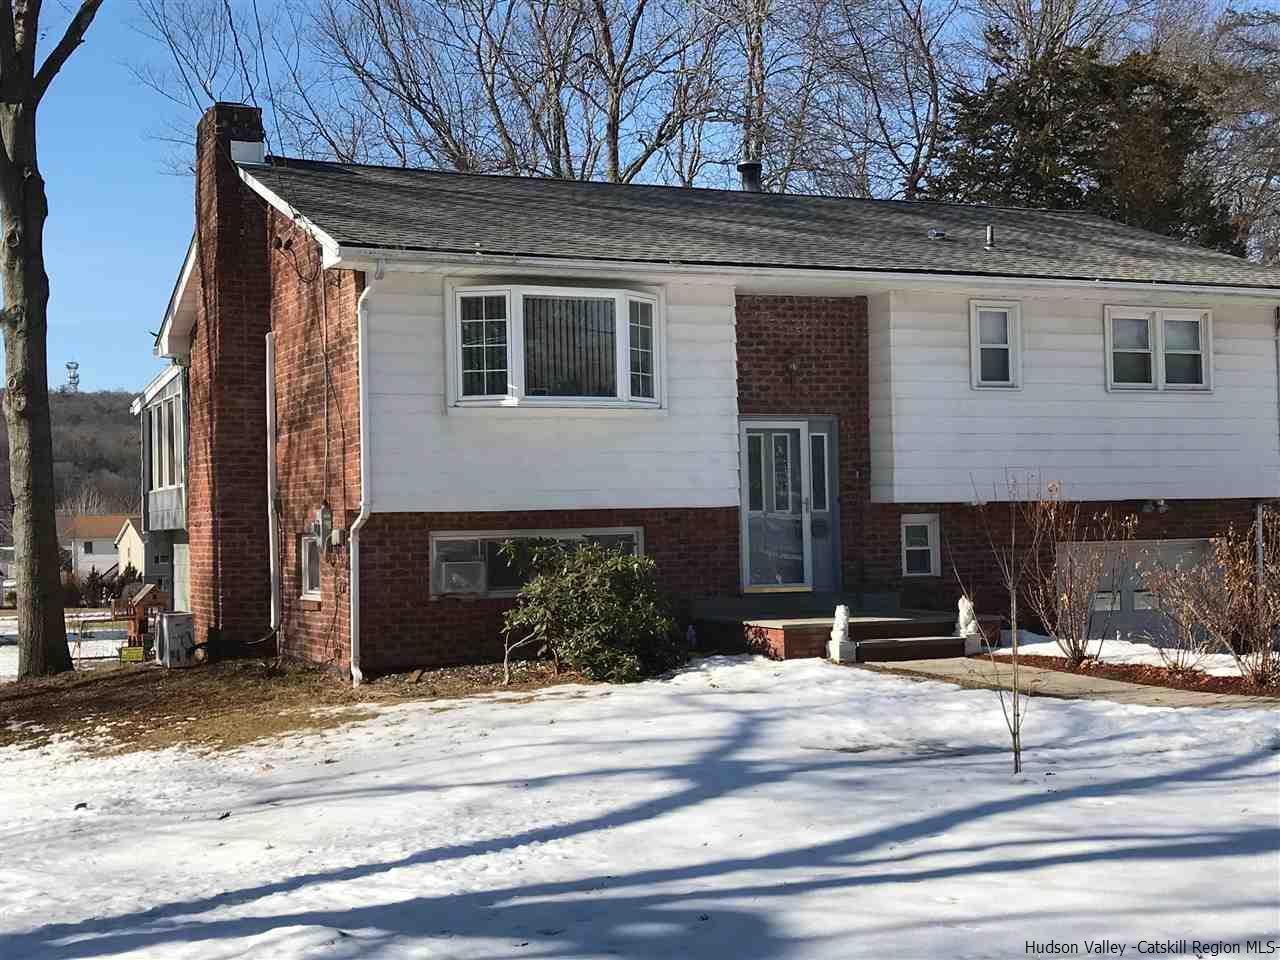 Single Family Home for Sale at 36 Vans Ter 36 Vans Ter Lake Katrine, New York 12449 United States